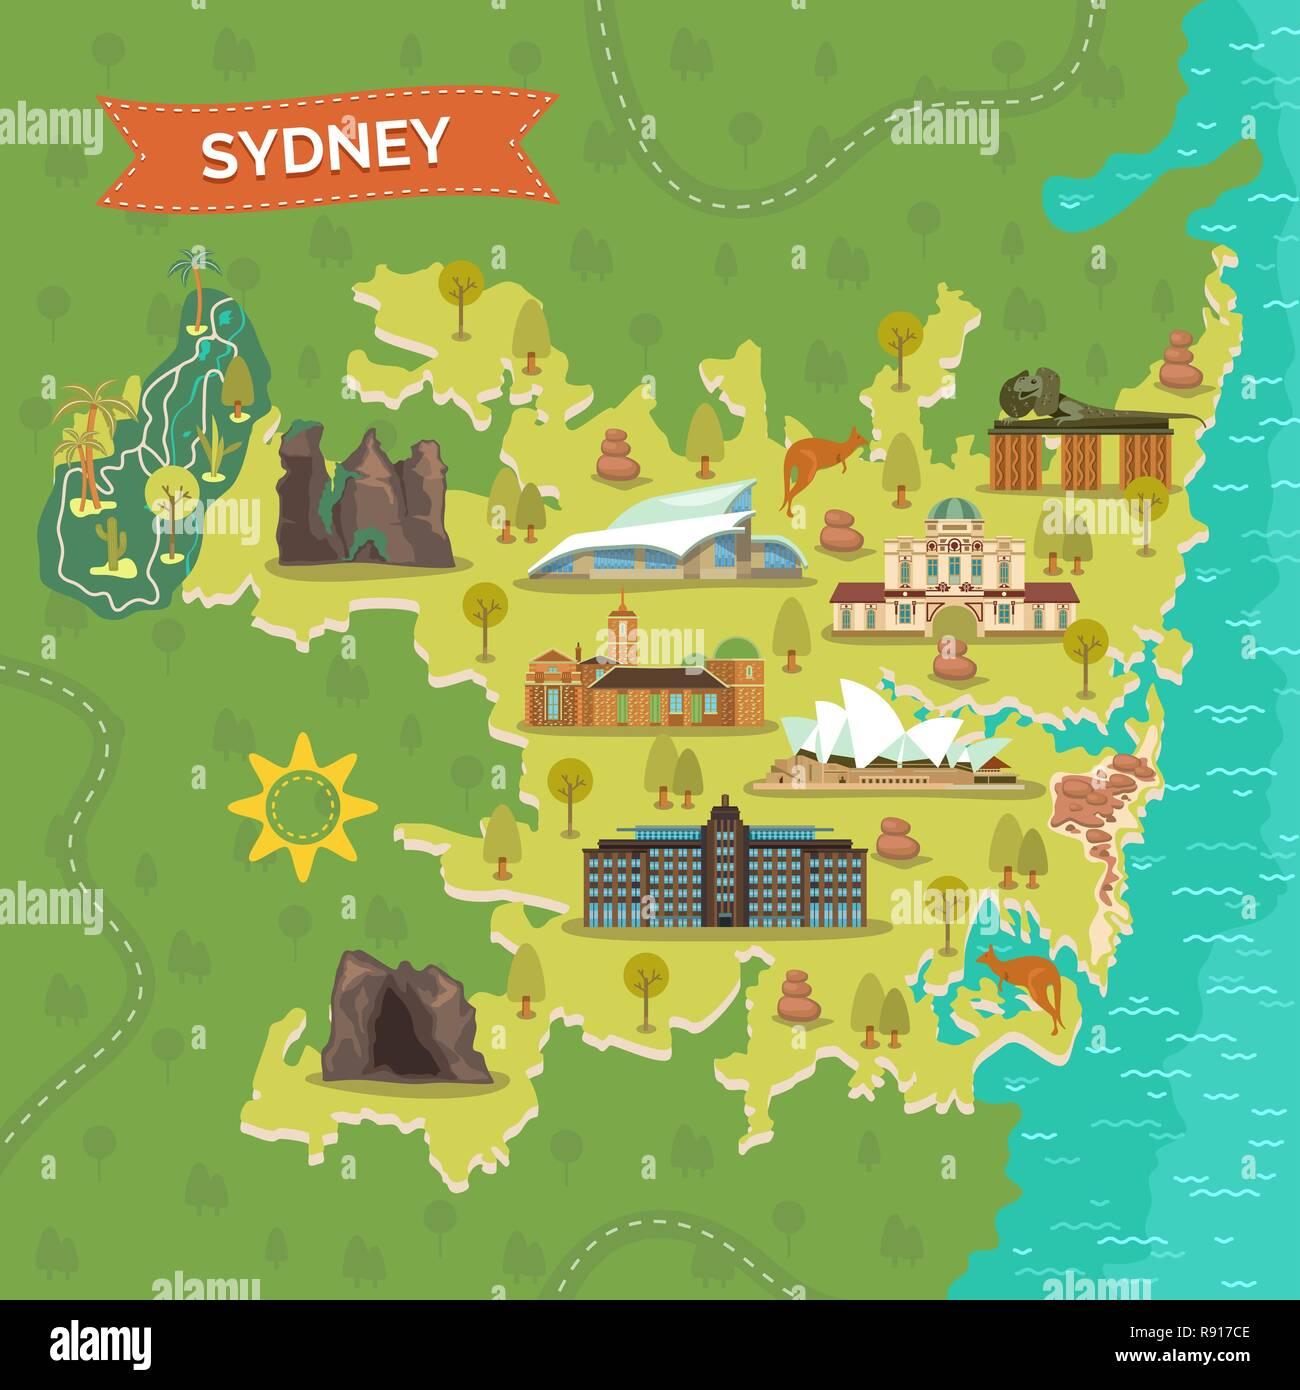 Map of Sydney with landmarks - Stock Image